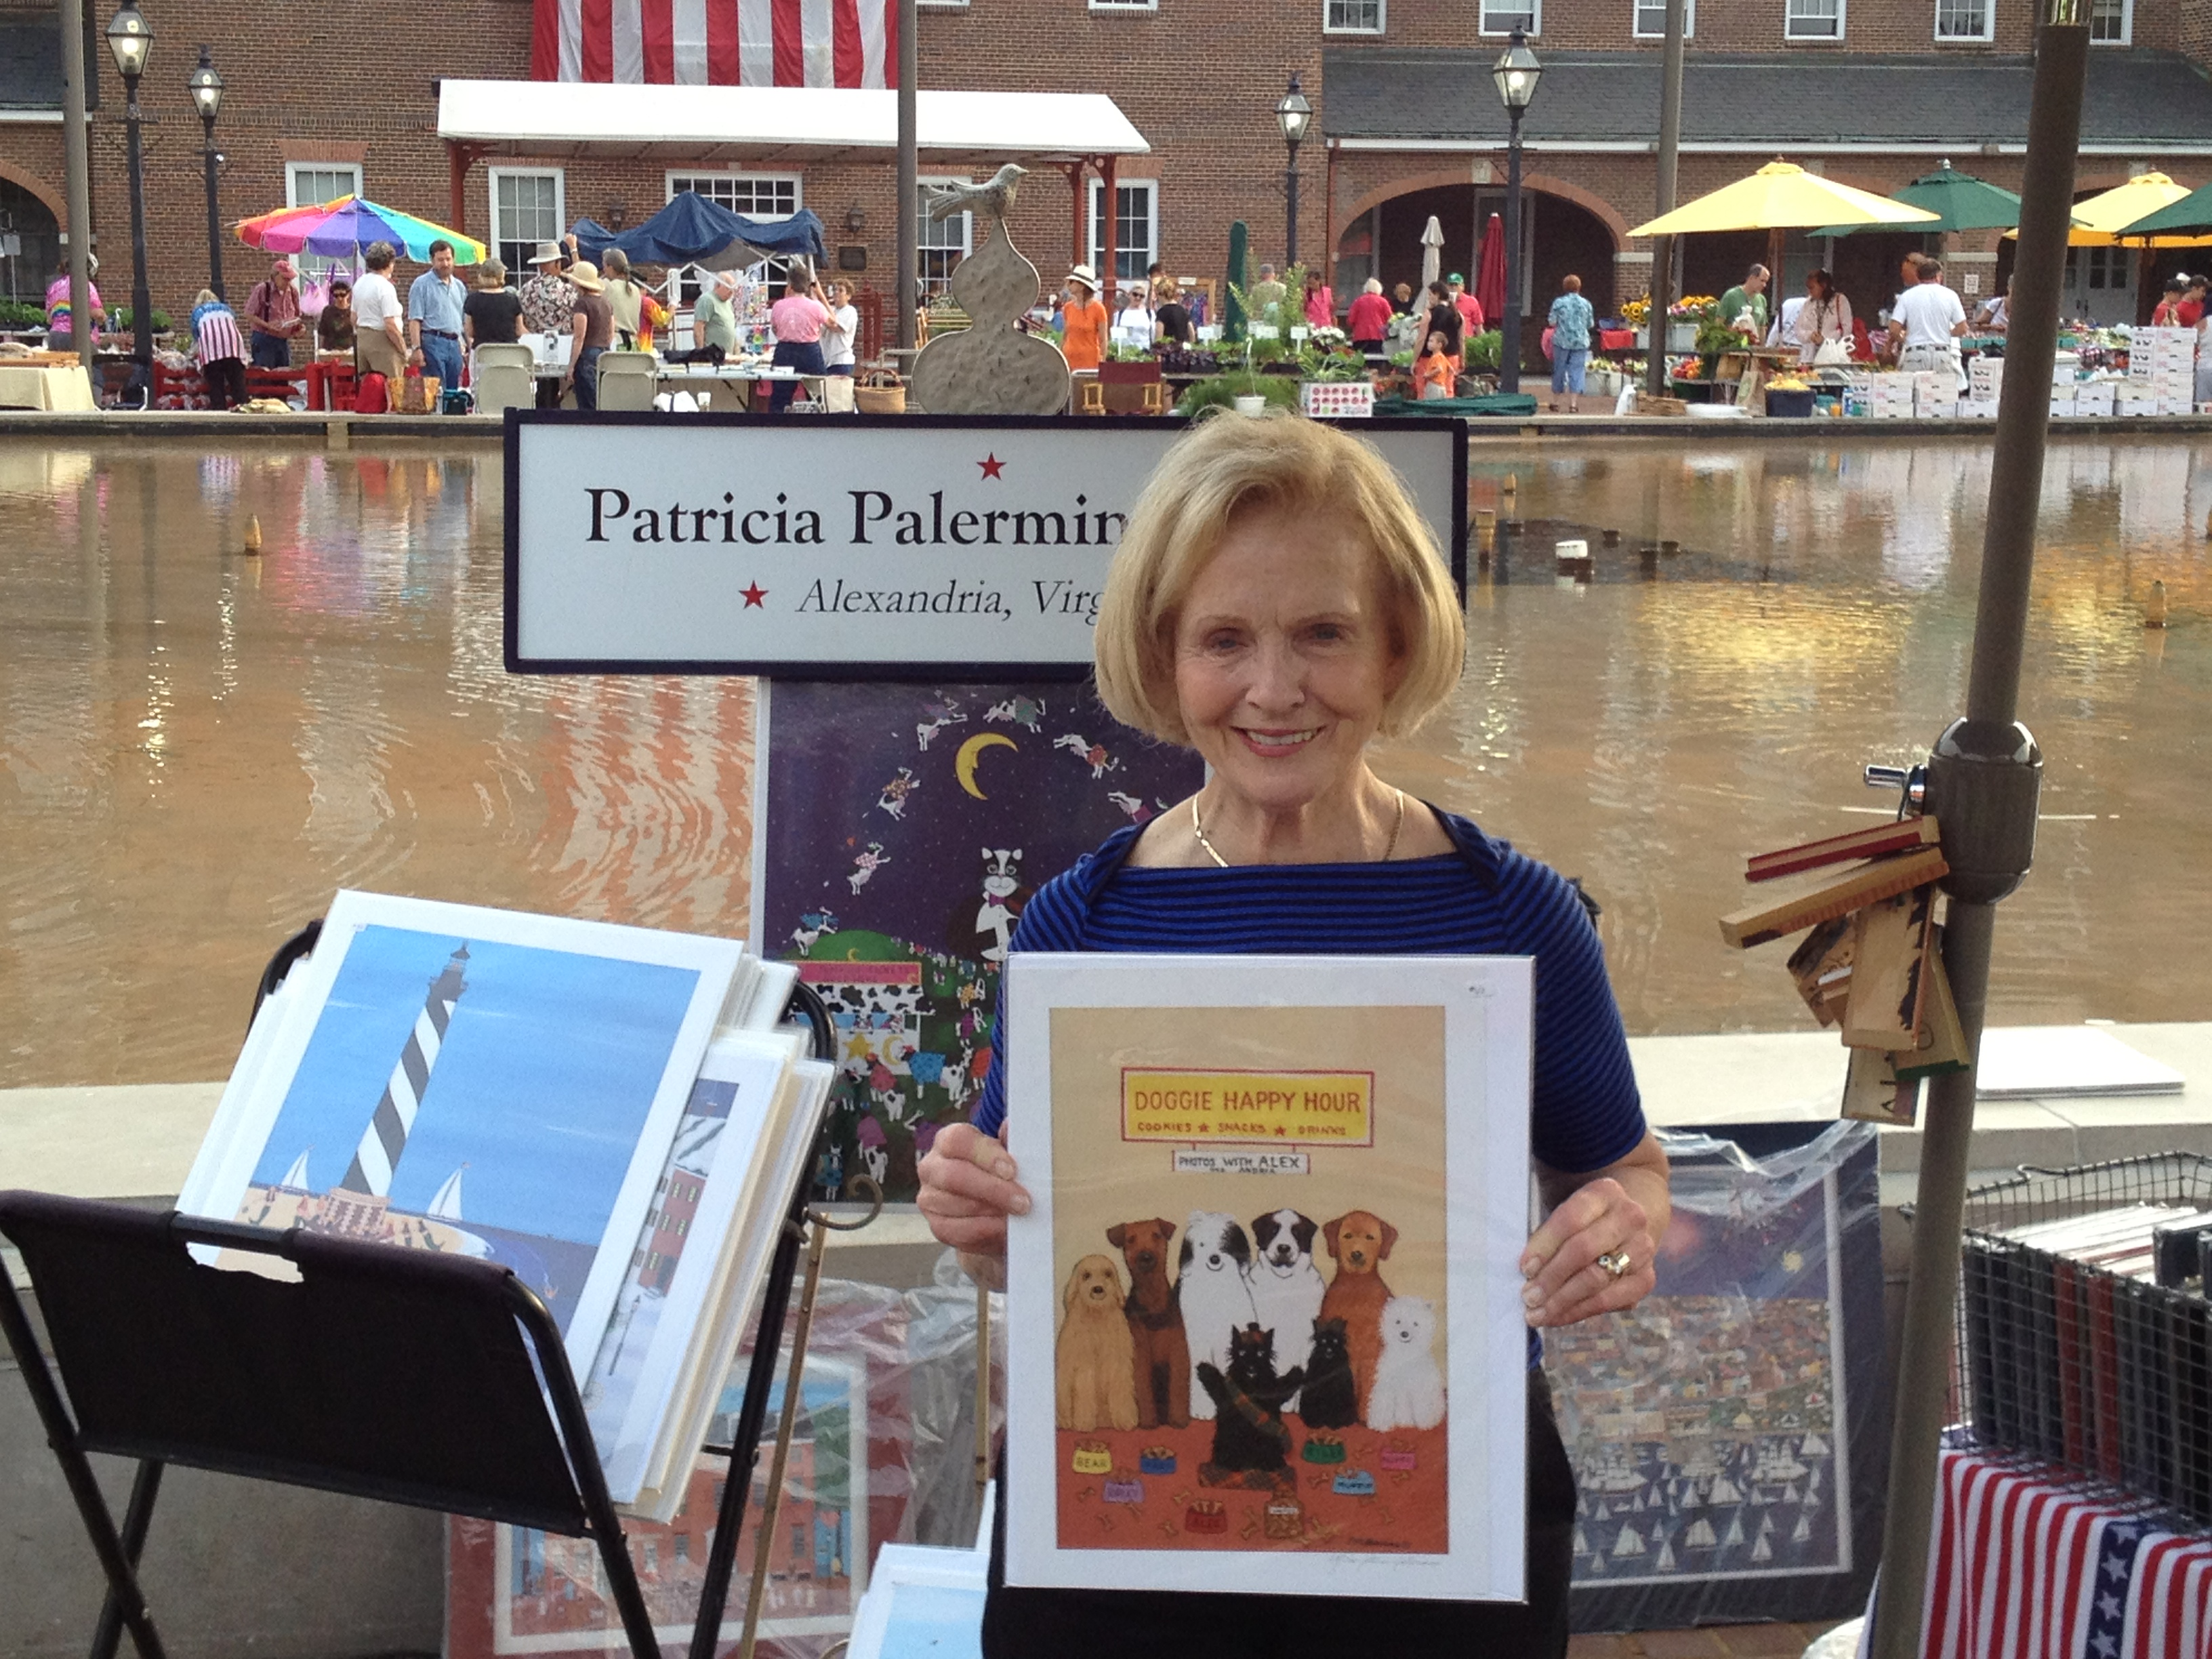 Patricia Palermino: American Folk Artist